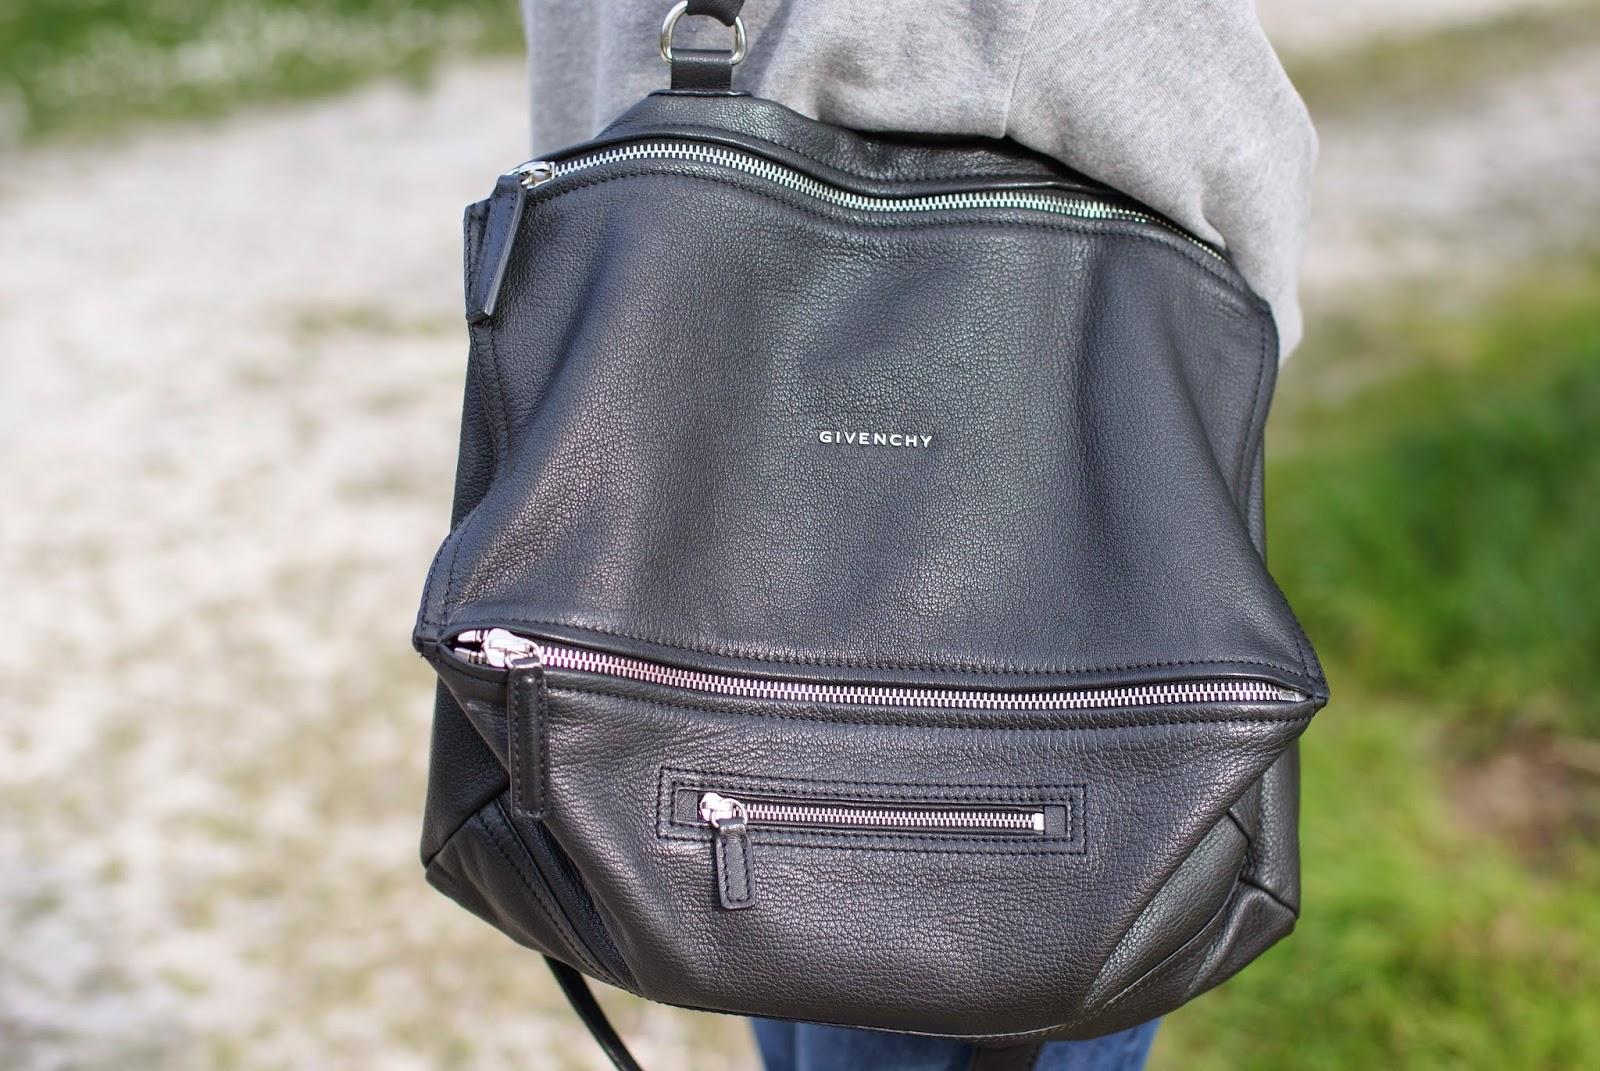 Givenchy Pandora large black bag, Fashion and Cookies, fashion blogger